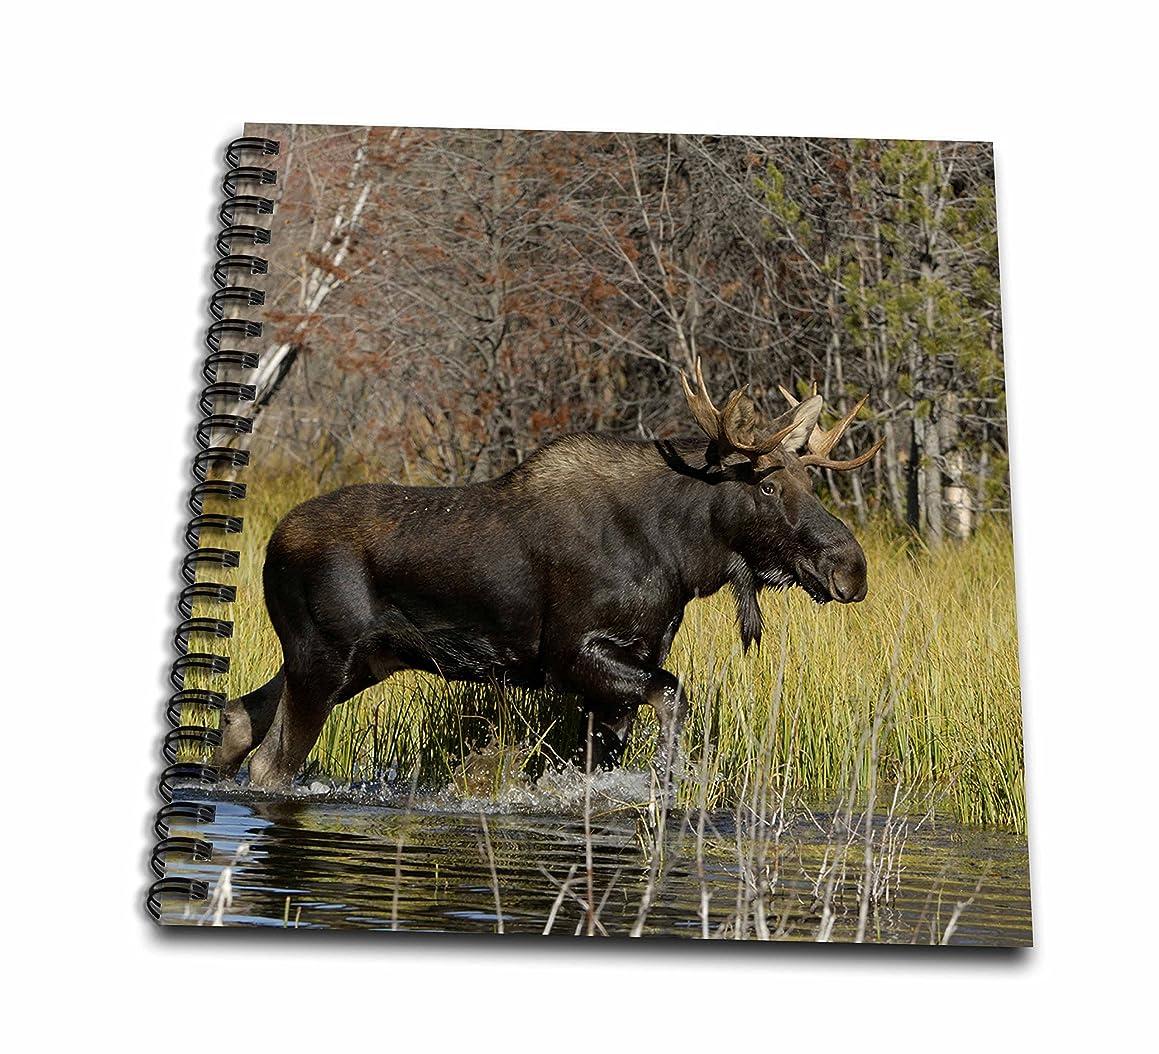 3dRose db_97570_1 Bull Moose Wildlife, Grand Teton Np, Wyoming-Us51 Rnu0047-Rolf Nussbaumer-Drawing Book, 8 by 8-Inch